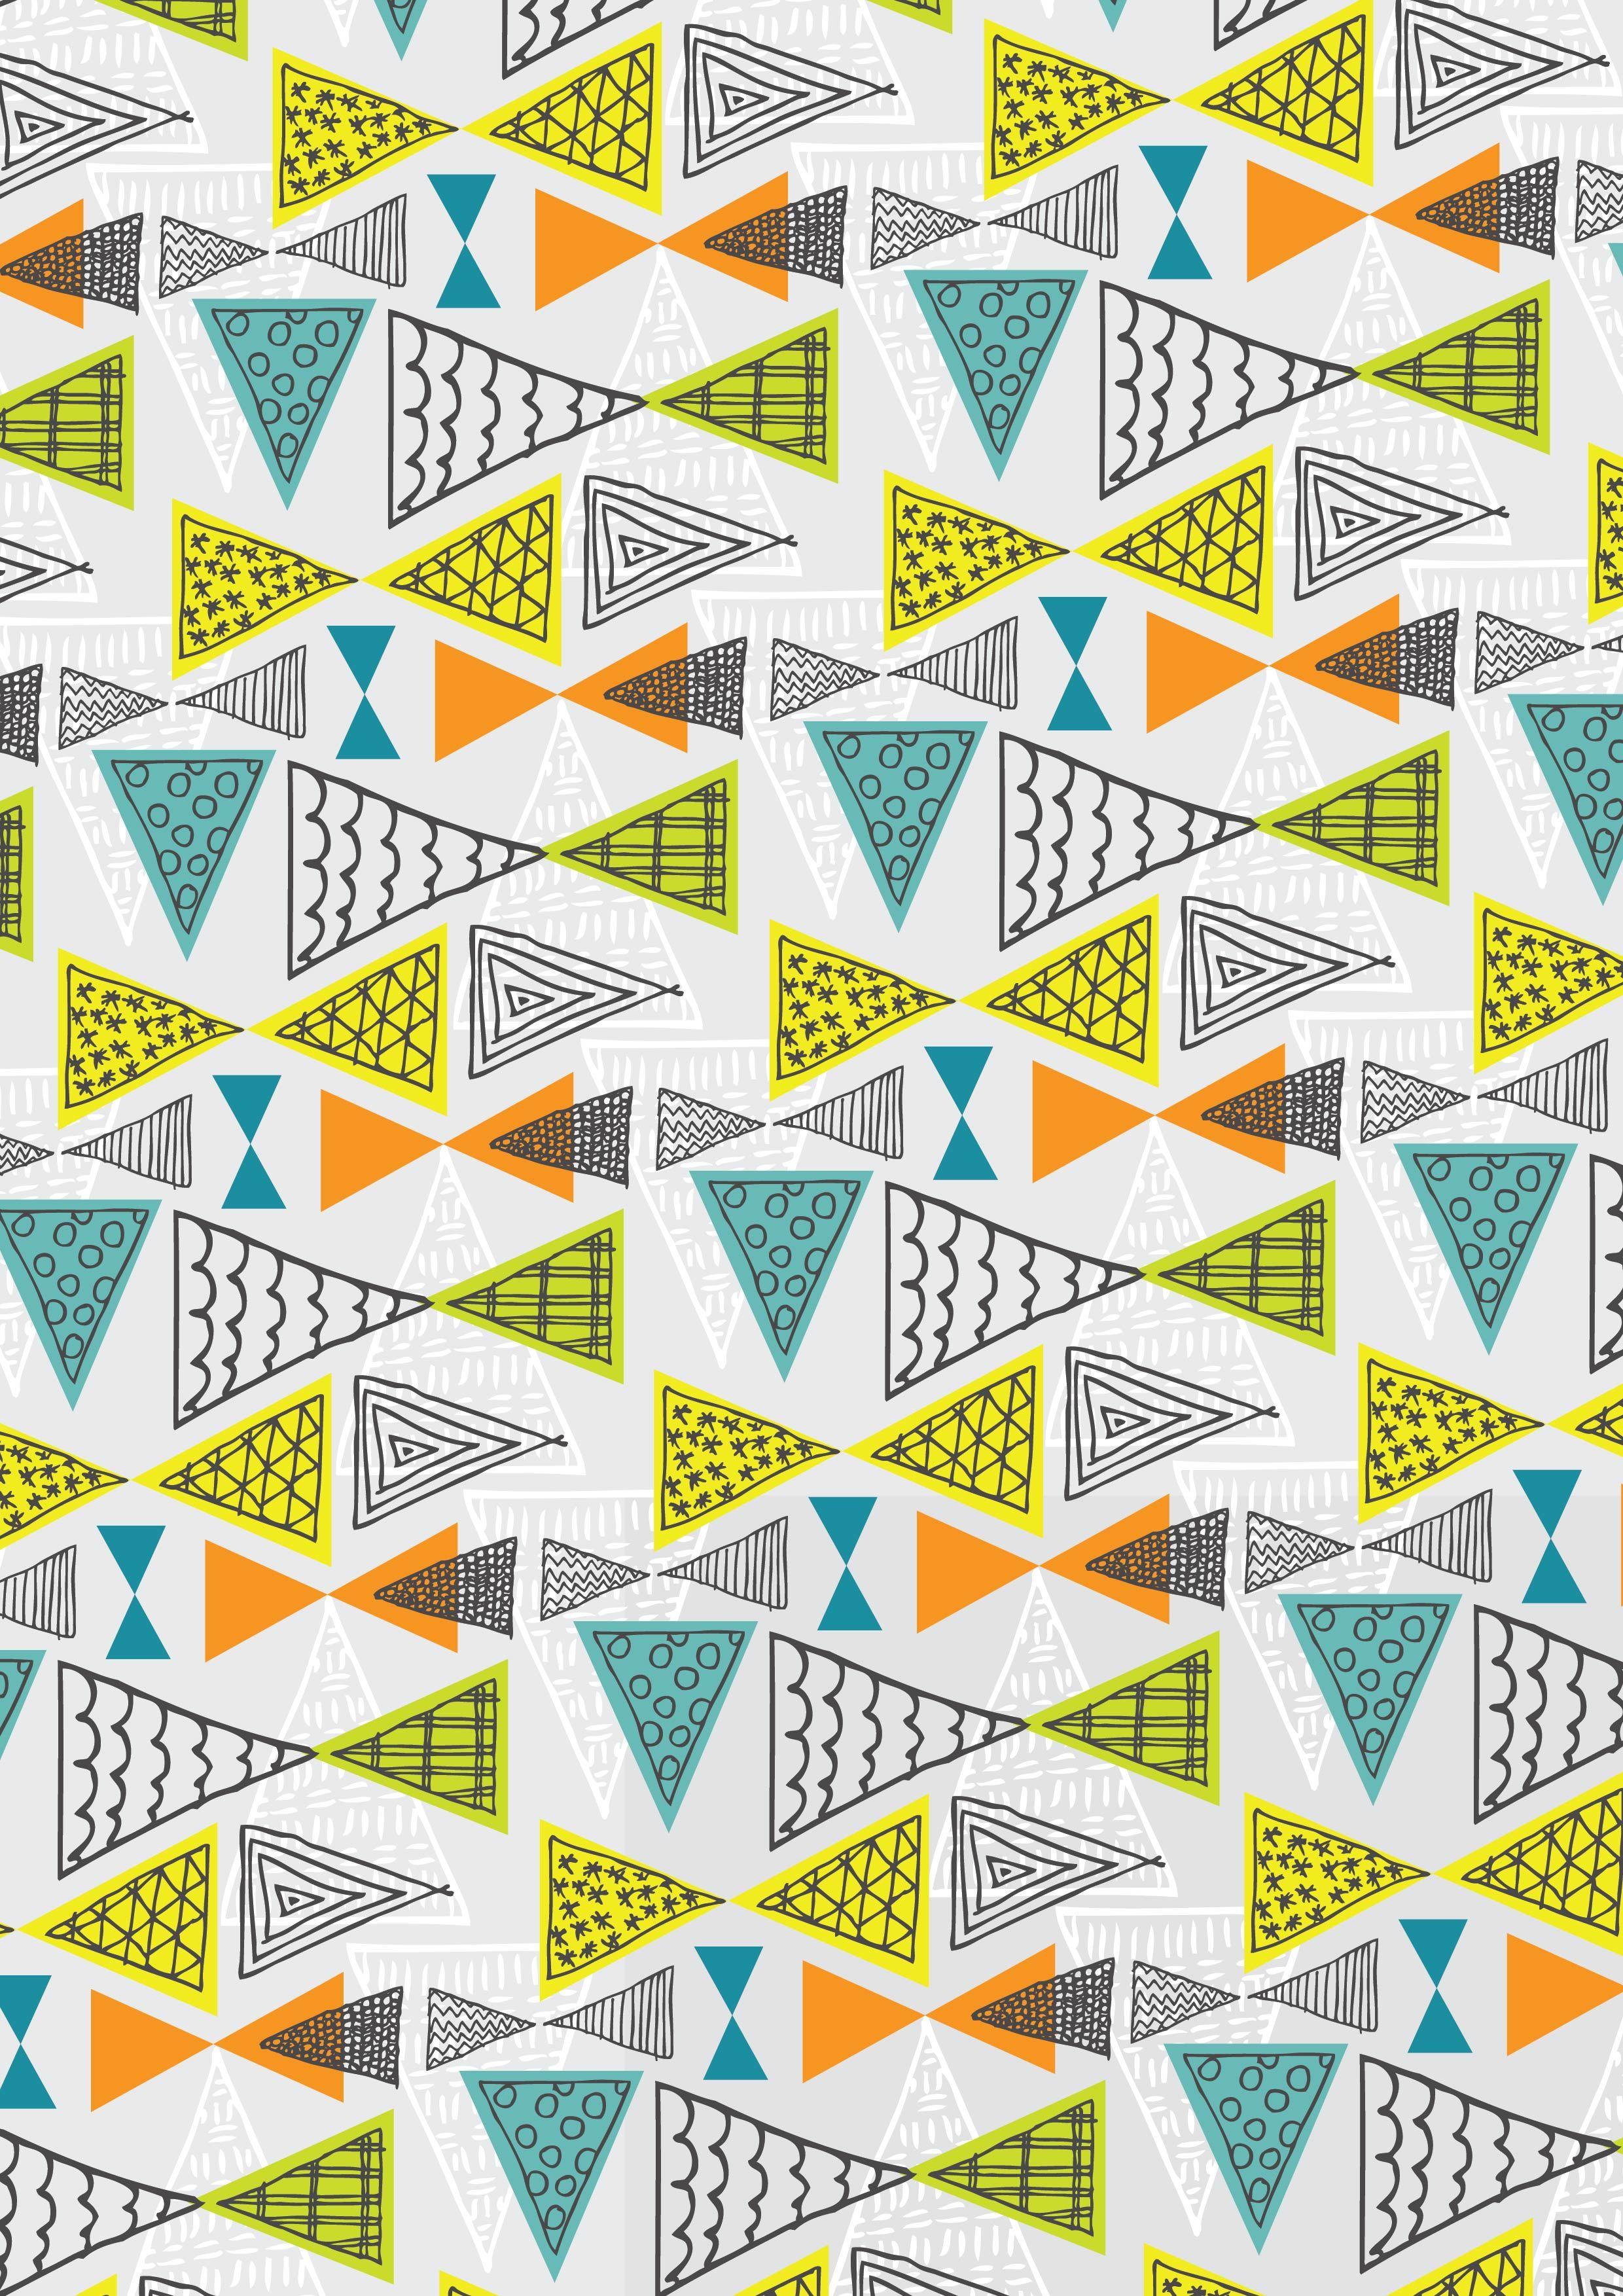 doodle geometric mid century modern triangles pattern ryan deighton design patterns. Black Bedroom Furniture Sets. Home Design Ideas